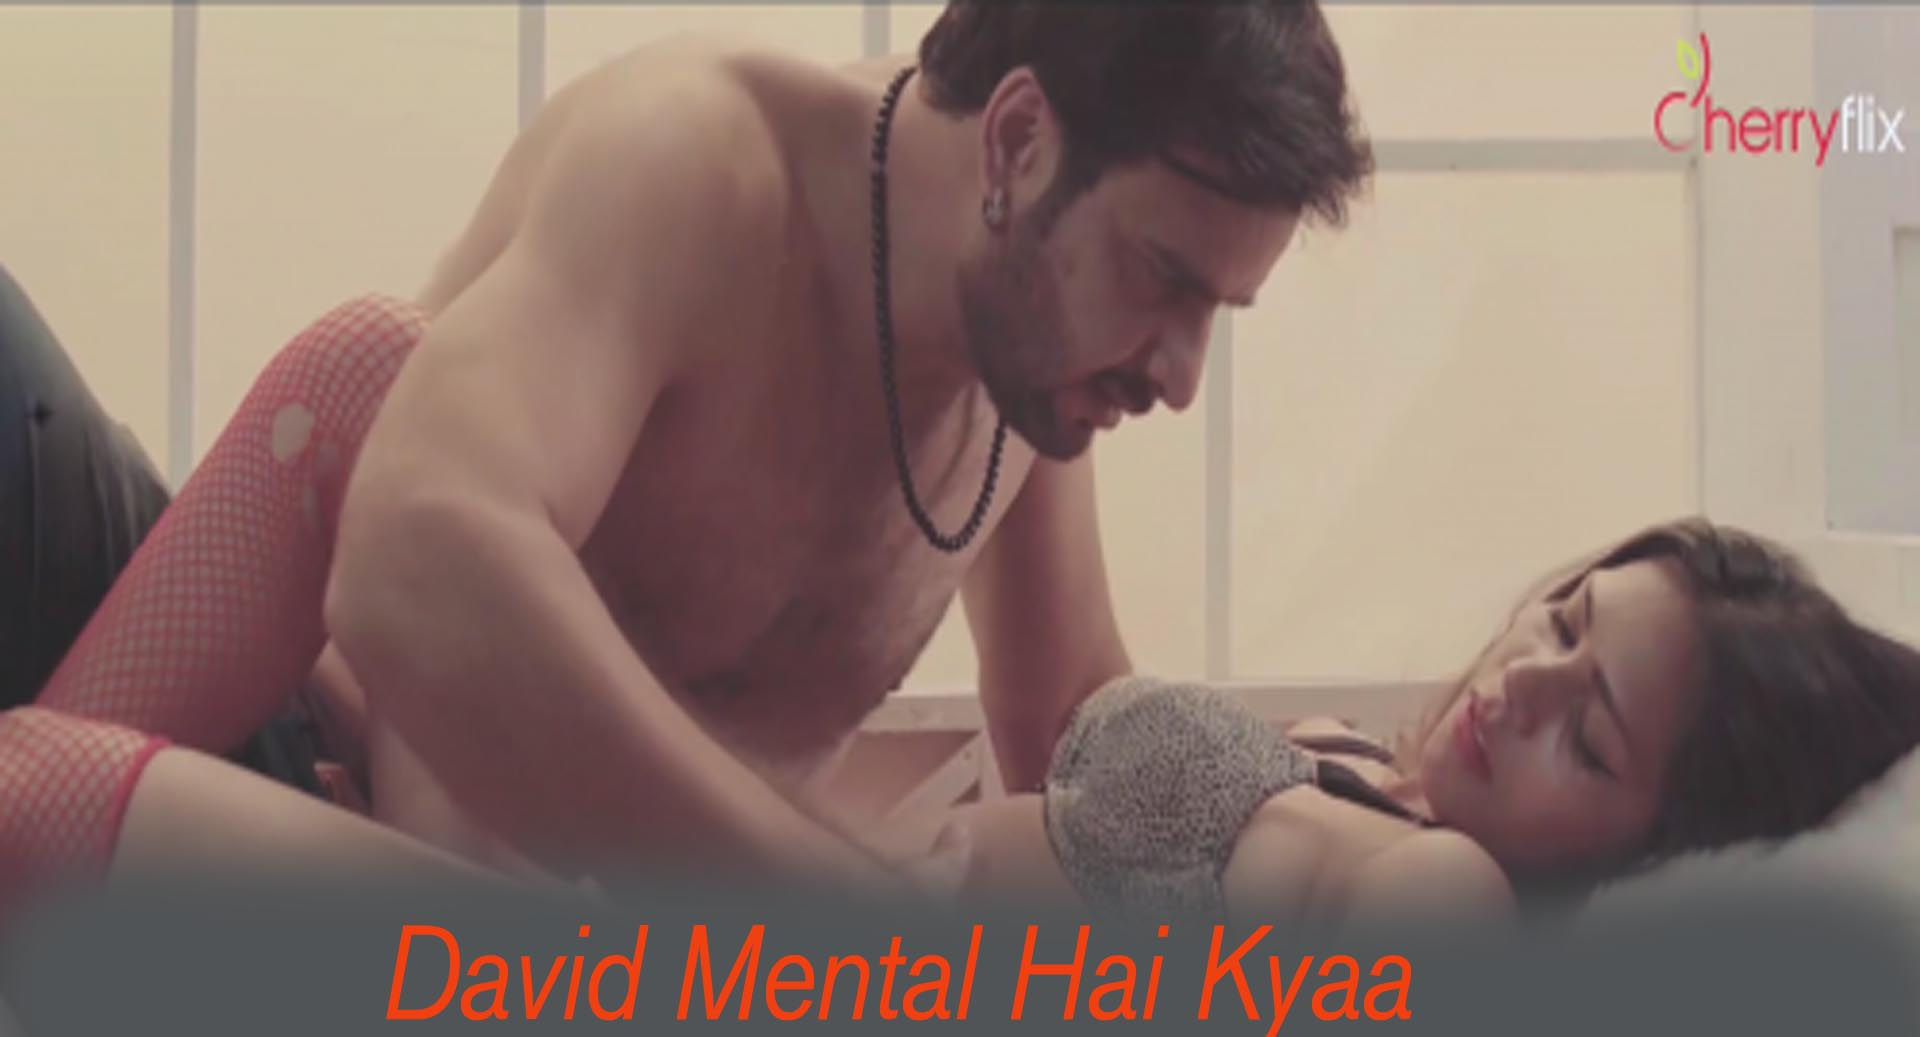 David Mental Hai Kyaa (2021) Hot Short Film – Cherryflix Originals